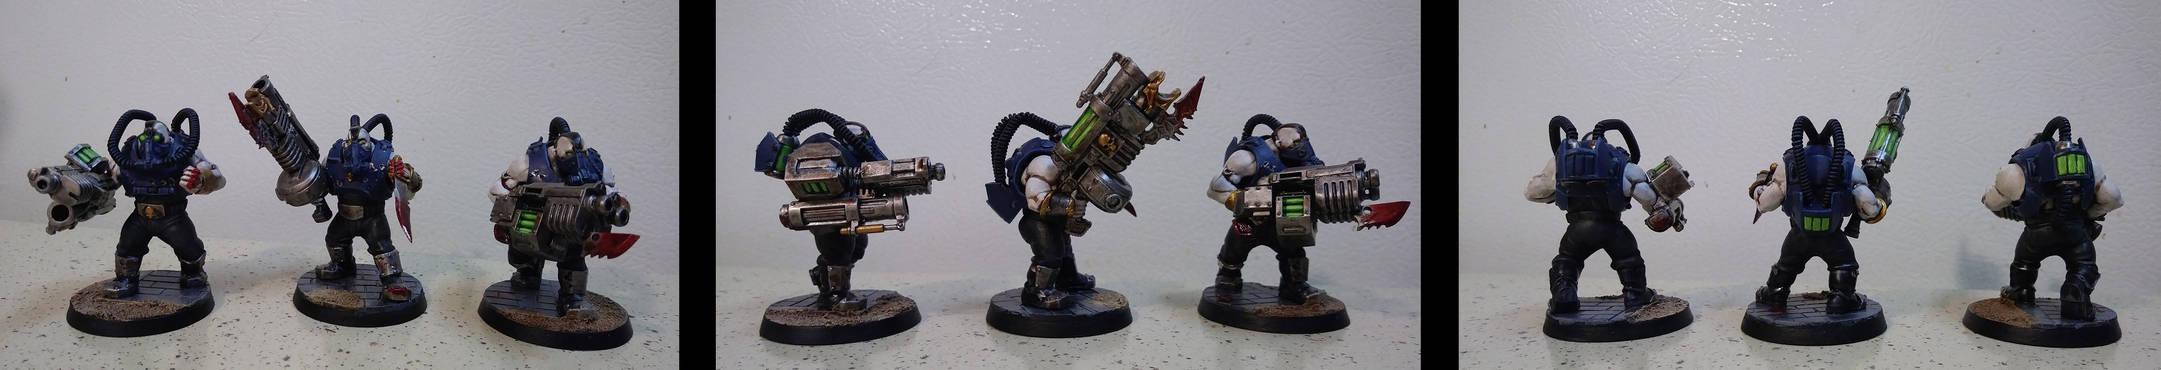 Obliterators